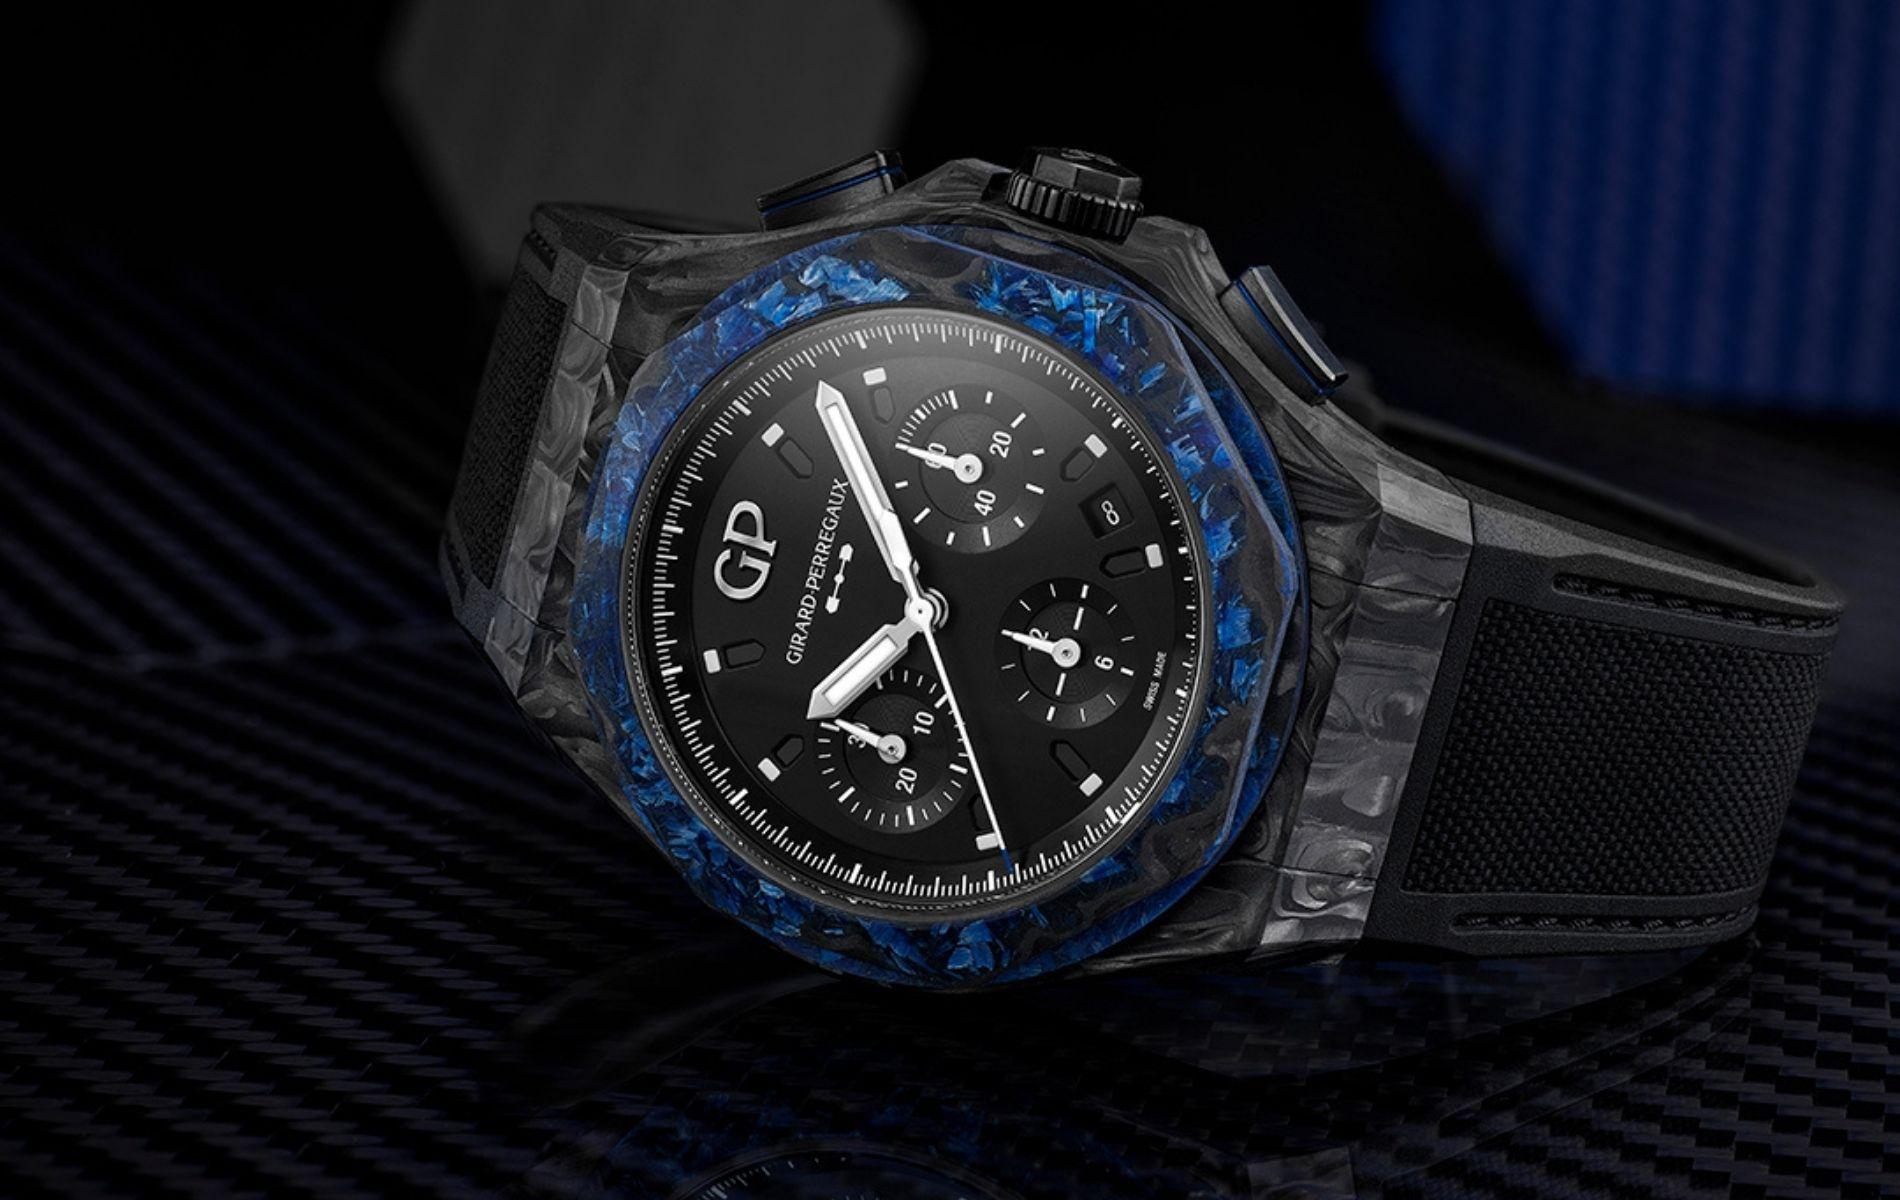 Girard-Perregaux Releases An Online-Exclusive Luxury Watch